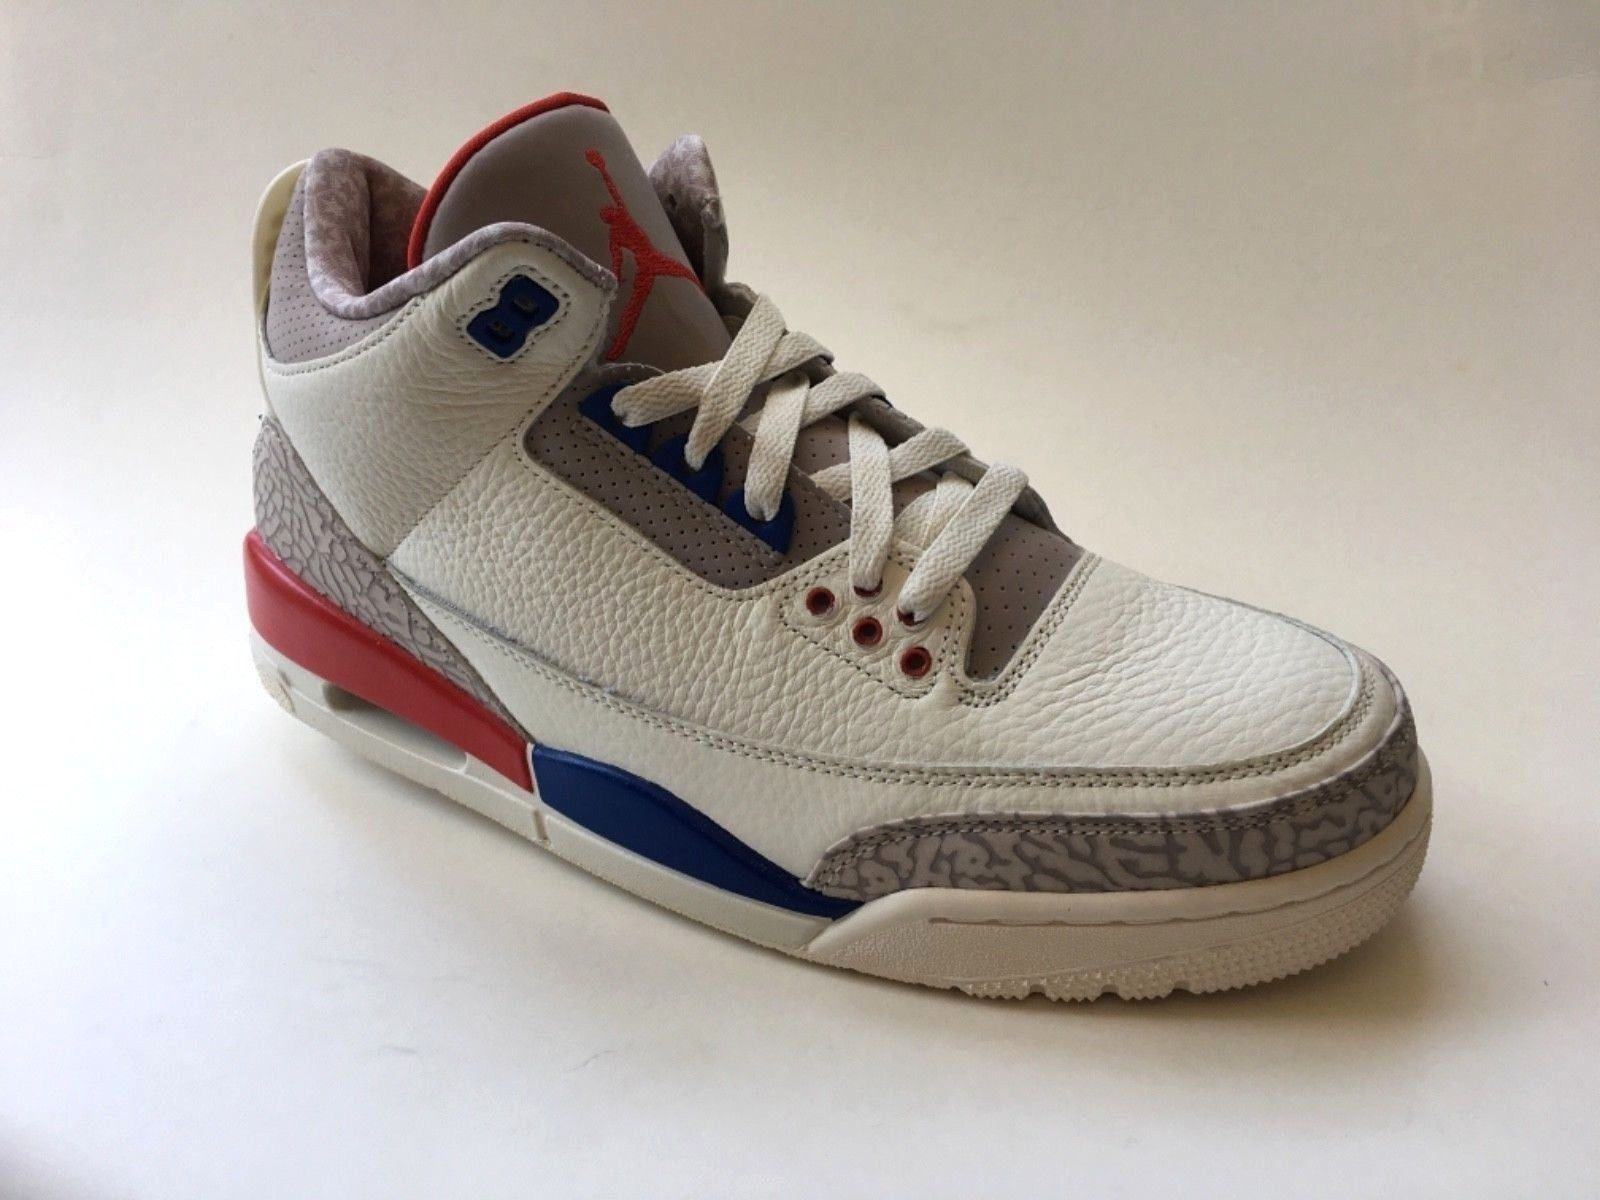 sports shoes 2beb4 08716 Air Jordan 3 Retro Charity Game USA International Flight IN STOCK Big Kid s  6.5 (eBay Link)